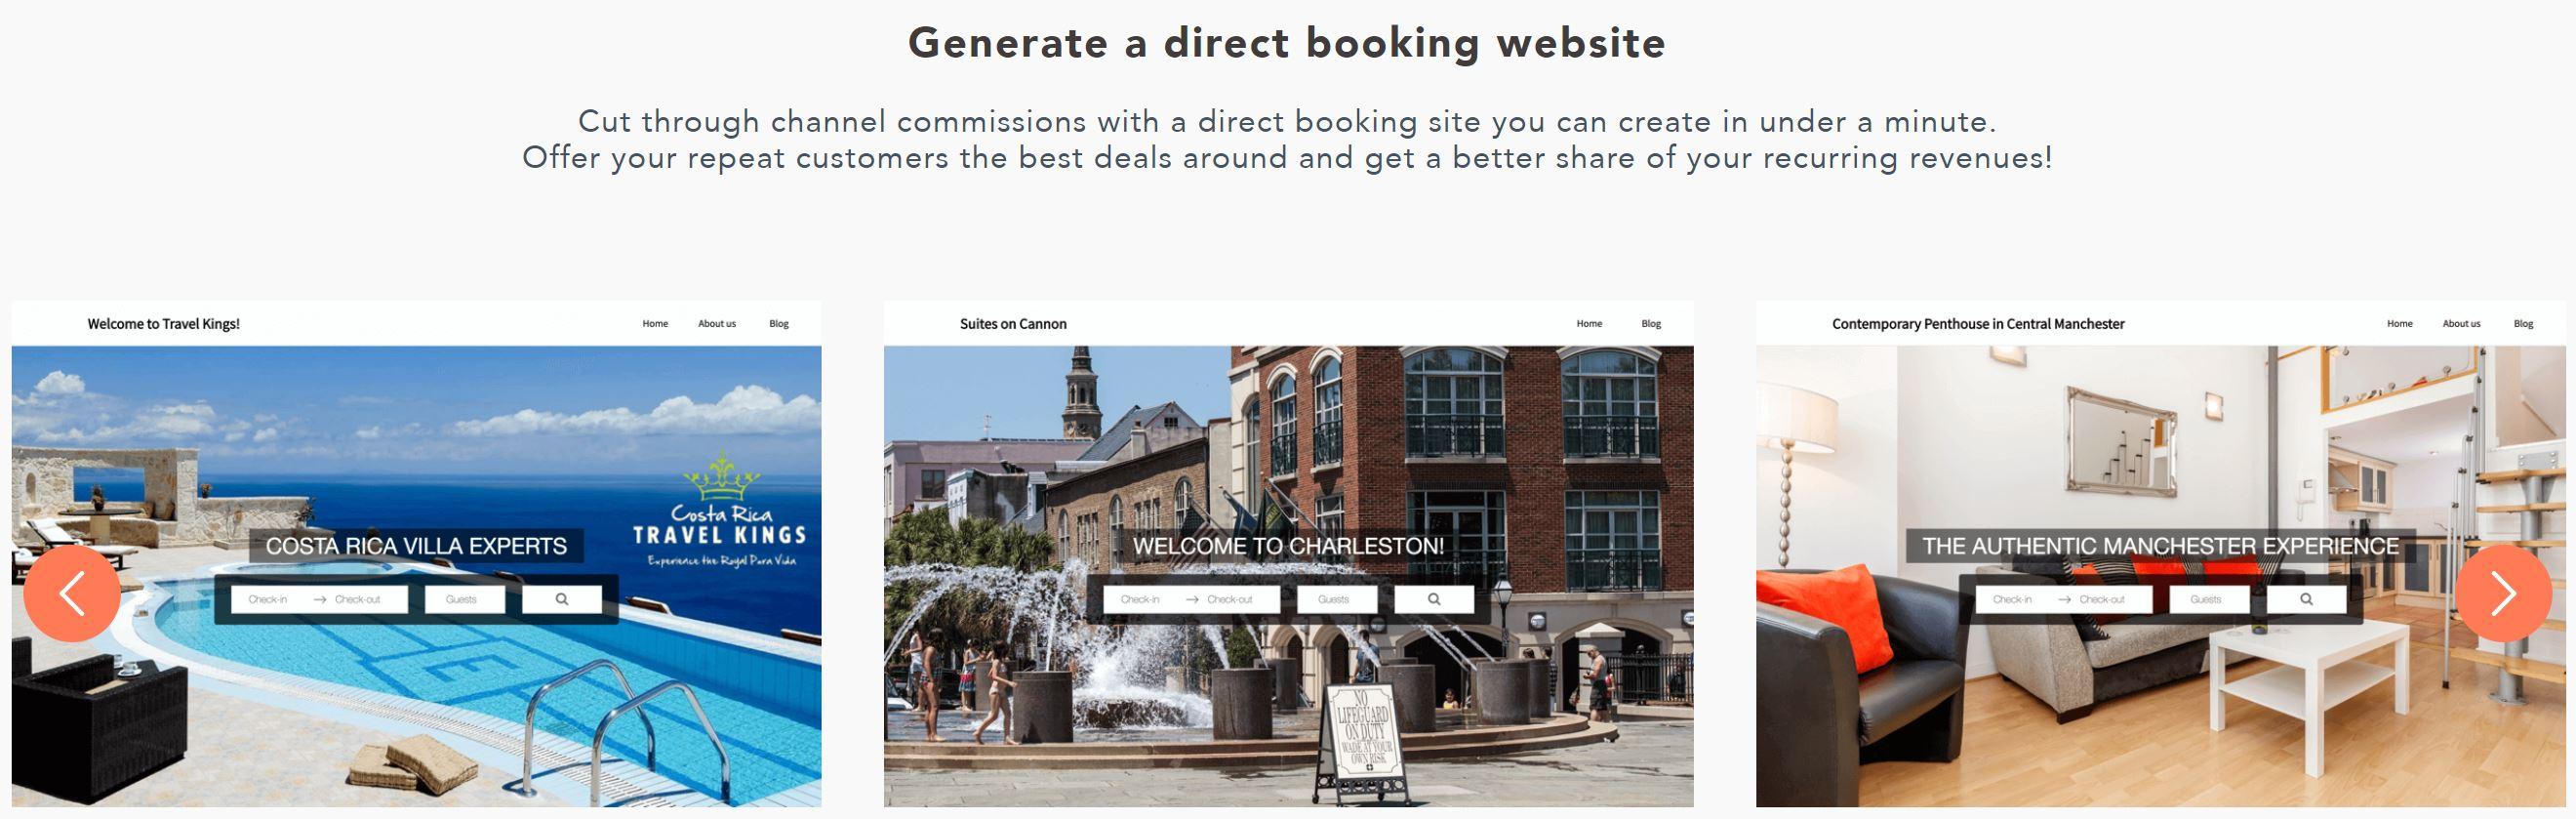 Hostaway Template Direct Booking Websites